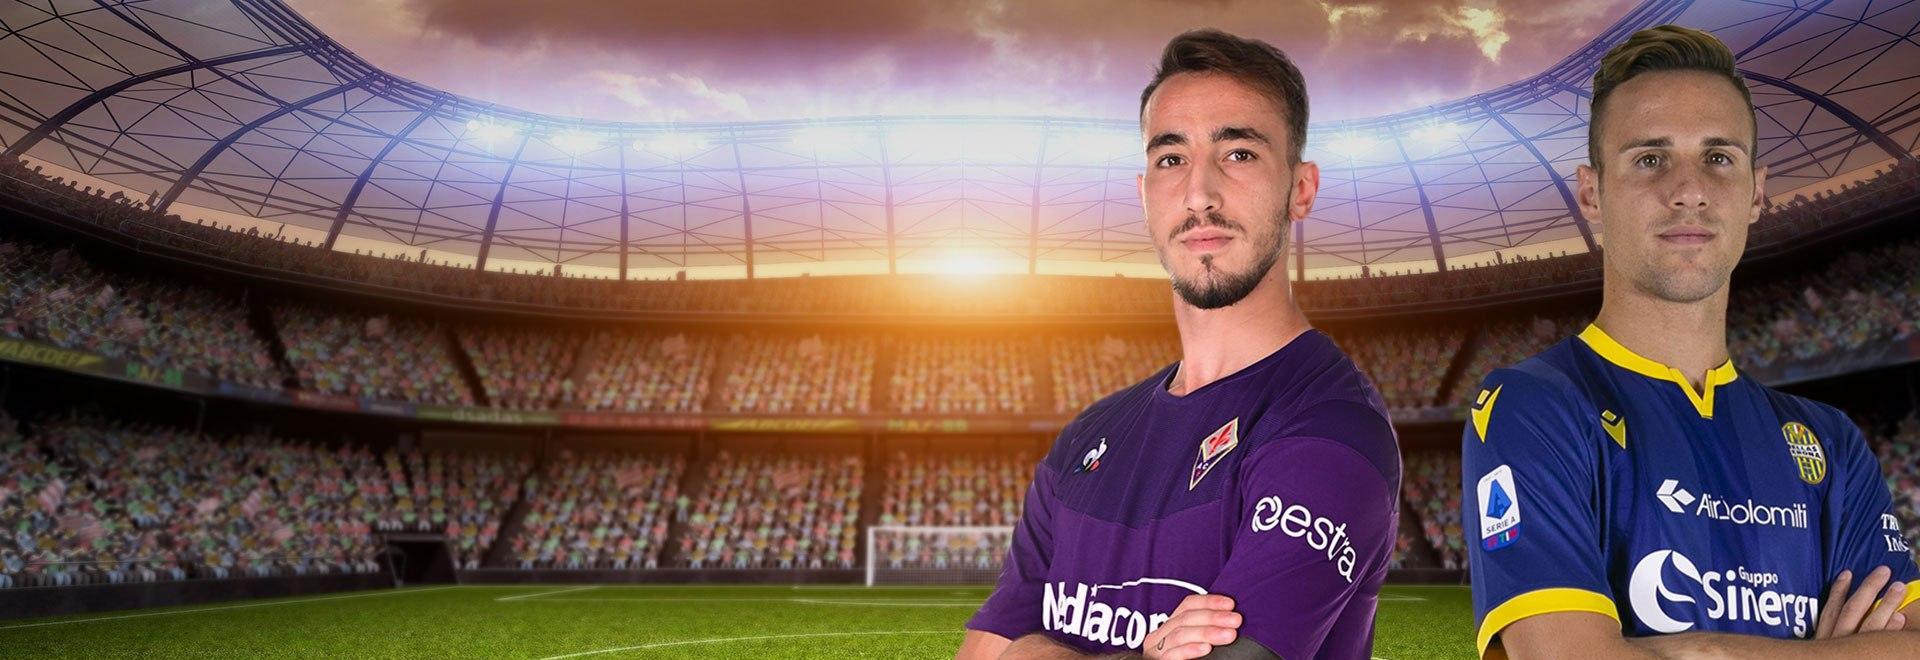 Fiorentina - Verona. 32a g.